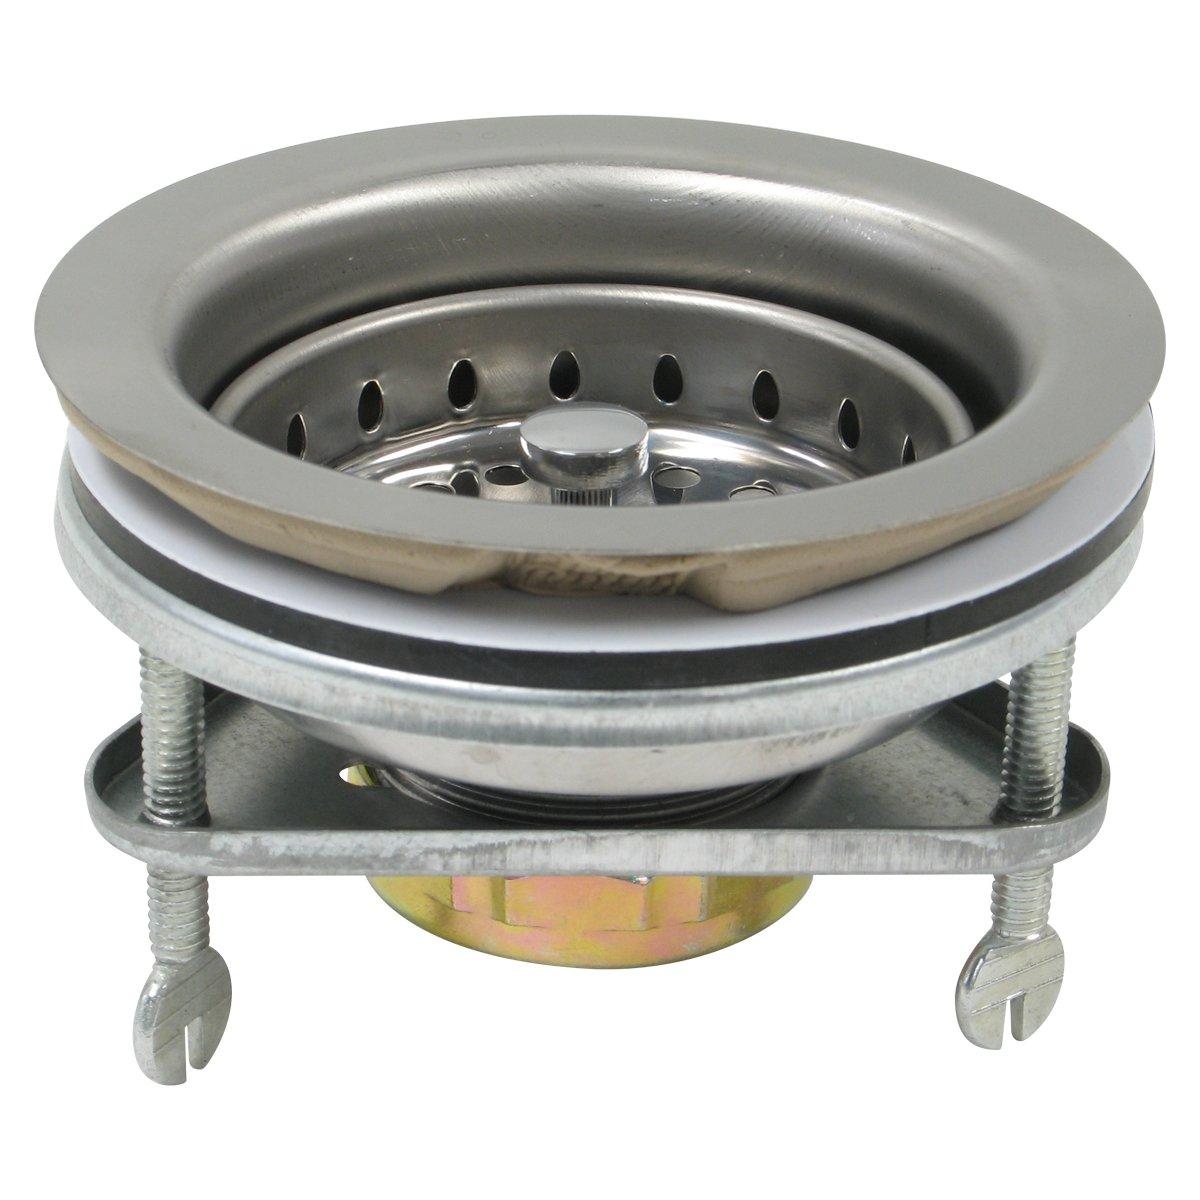 Perfect Putty 59-3140 Kitchen Sink Basket Strainer Assembly